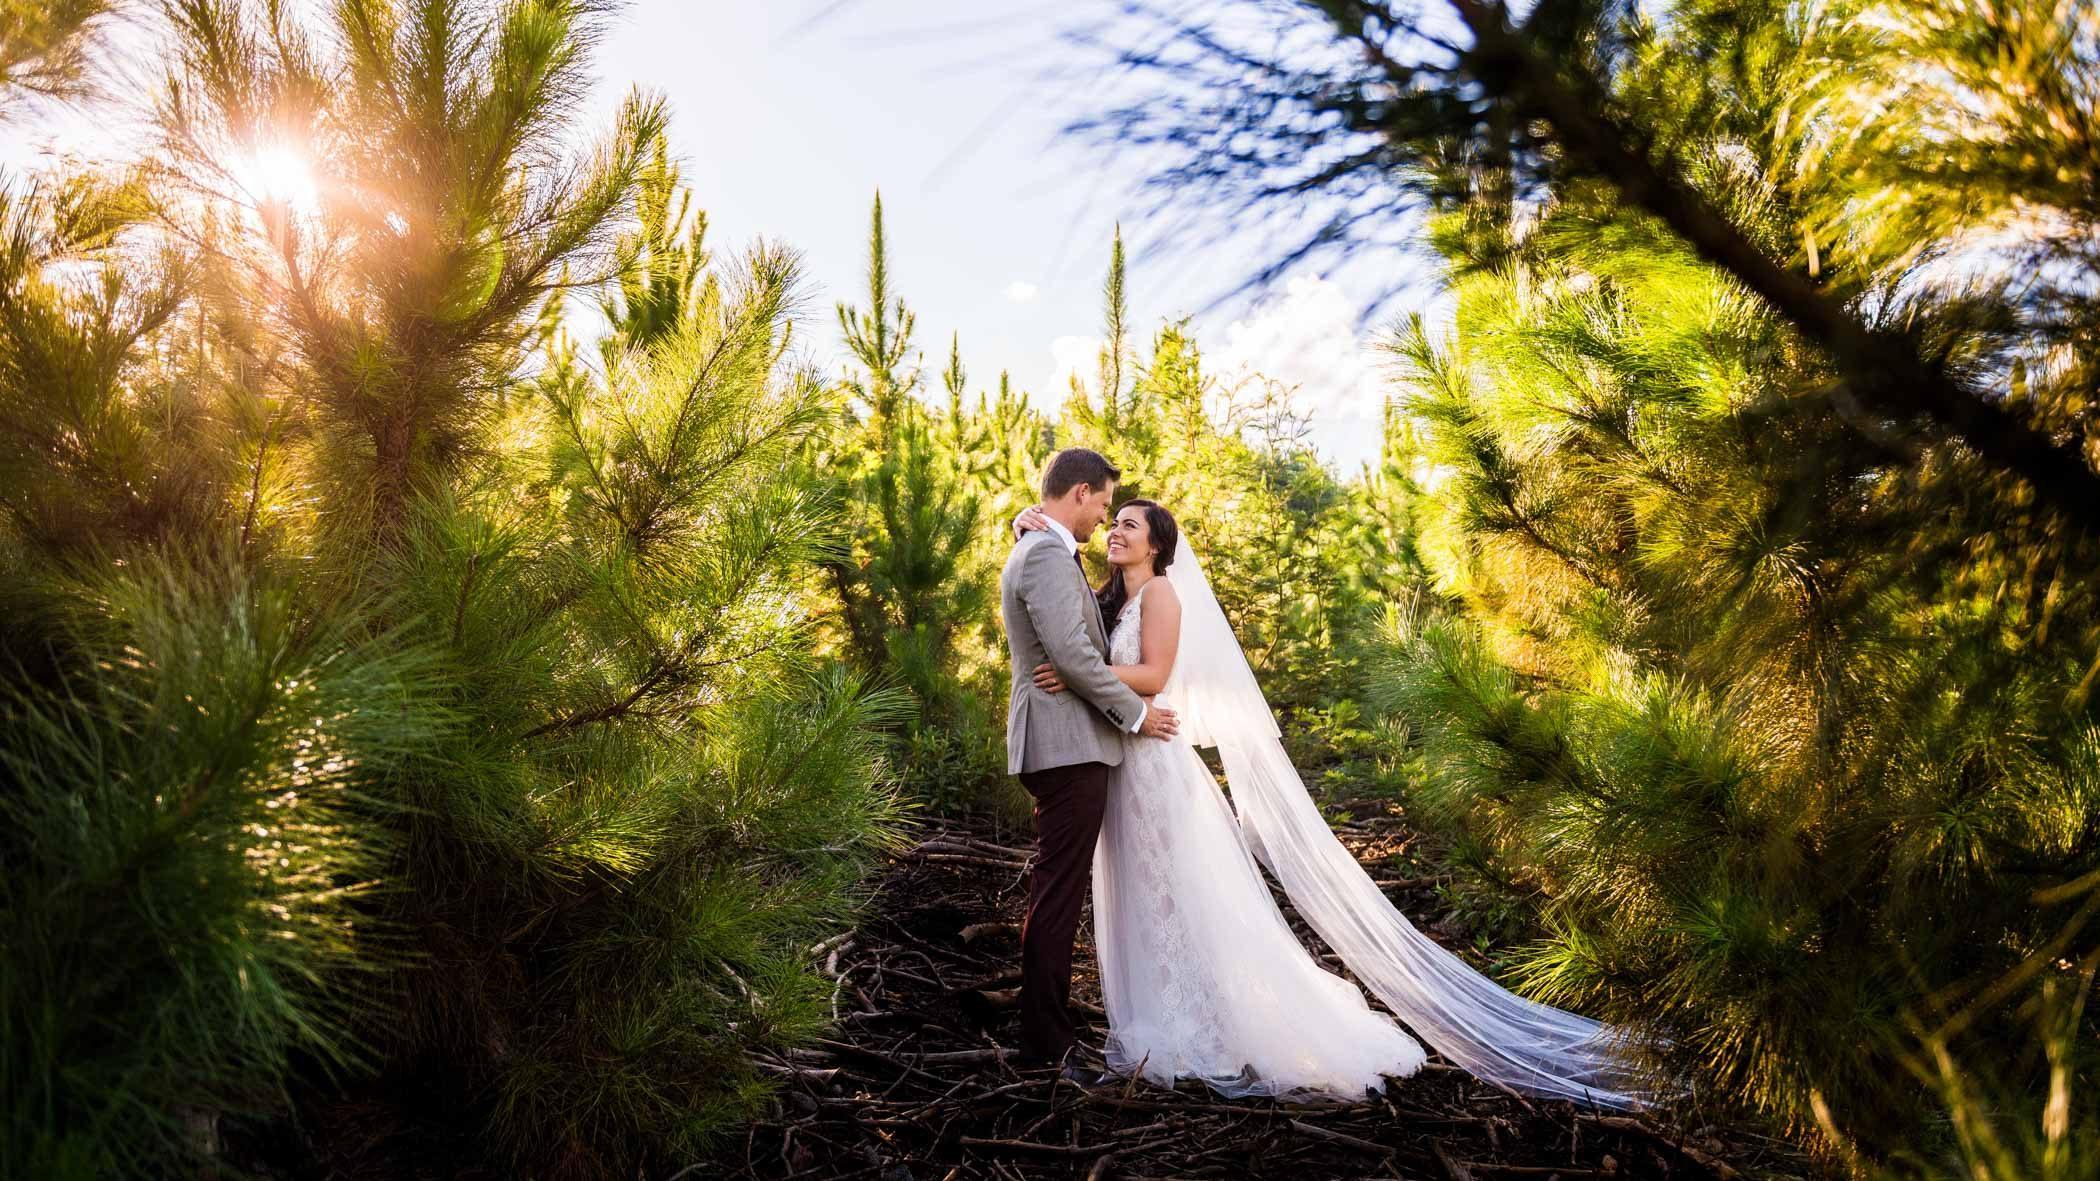 Beste bruidsfoto's 2018